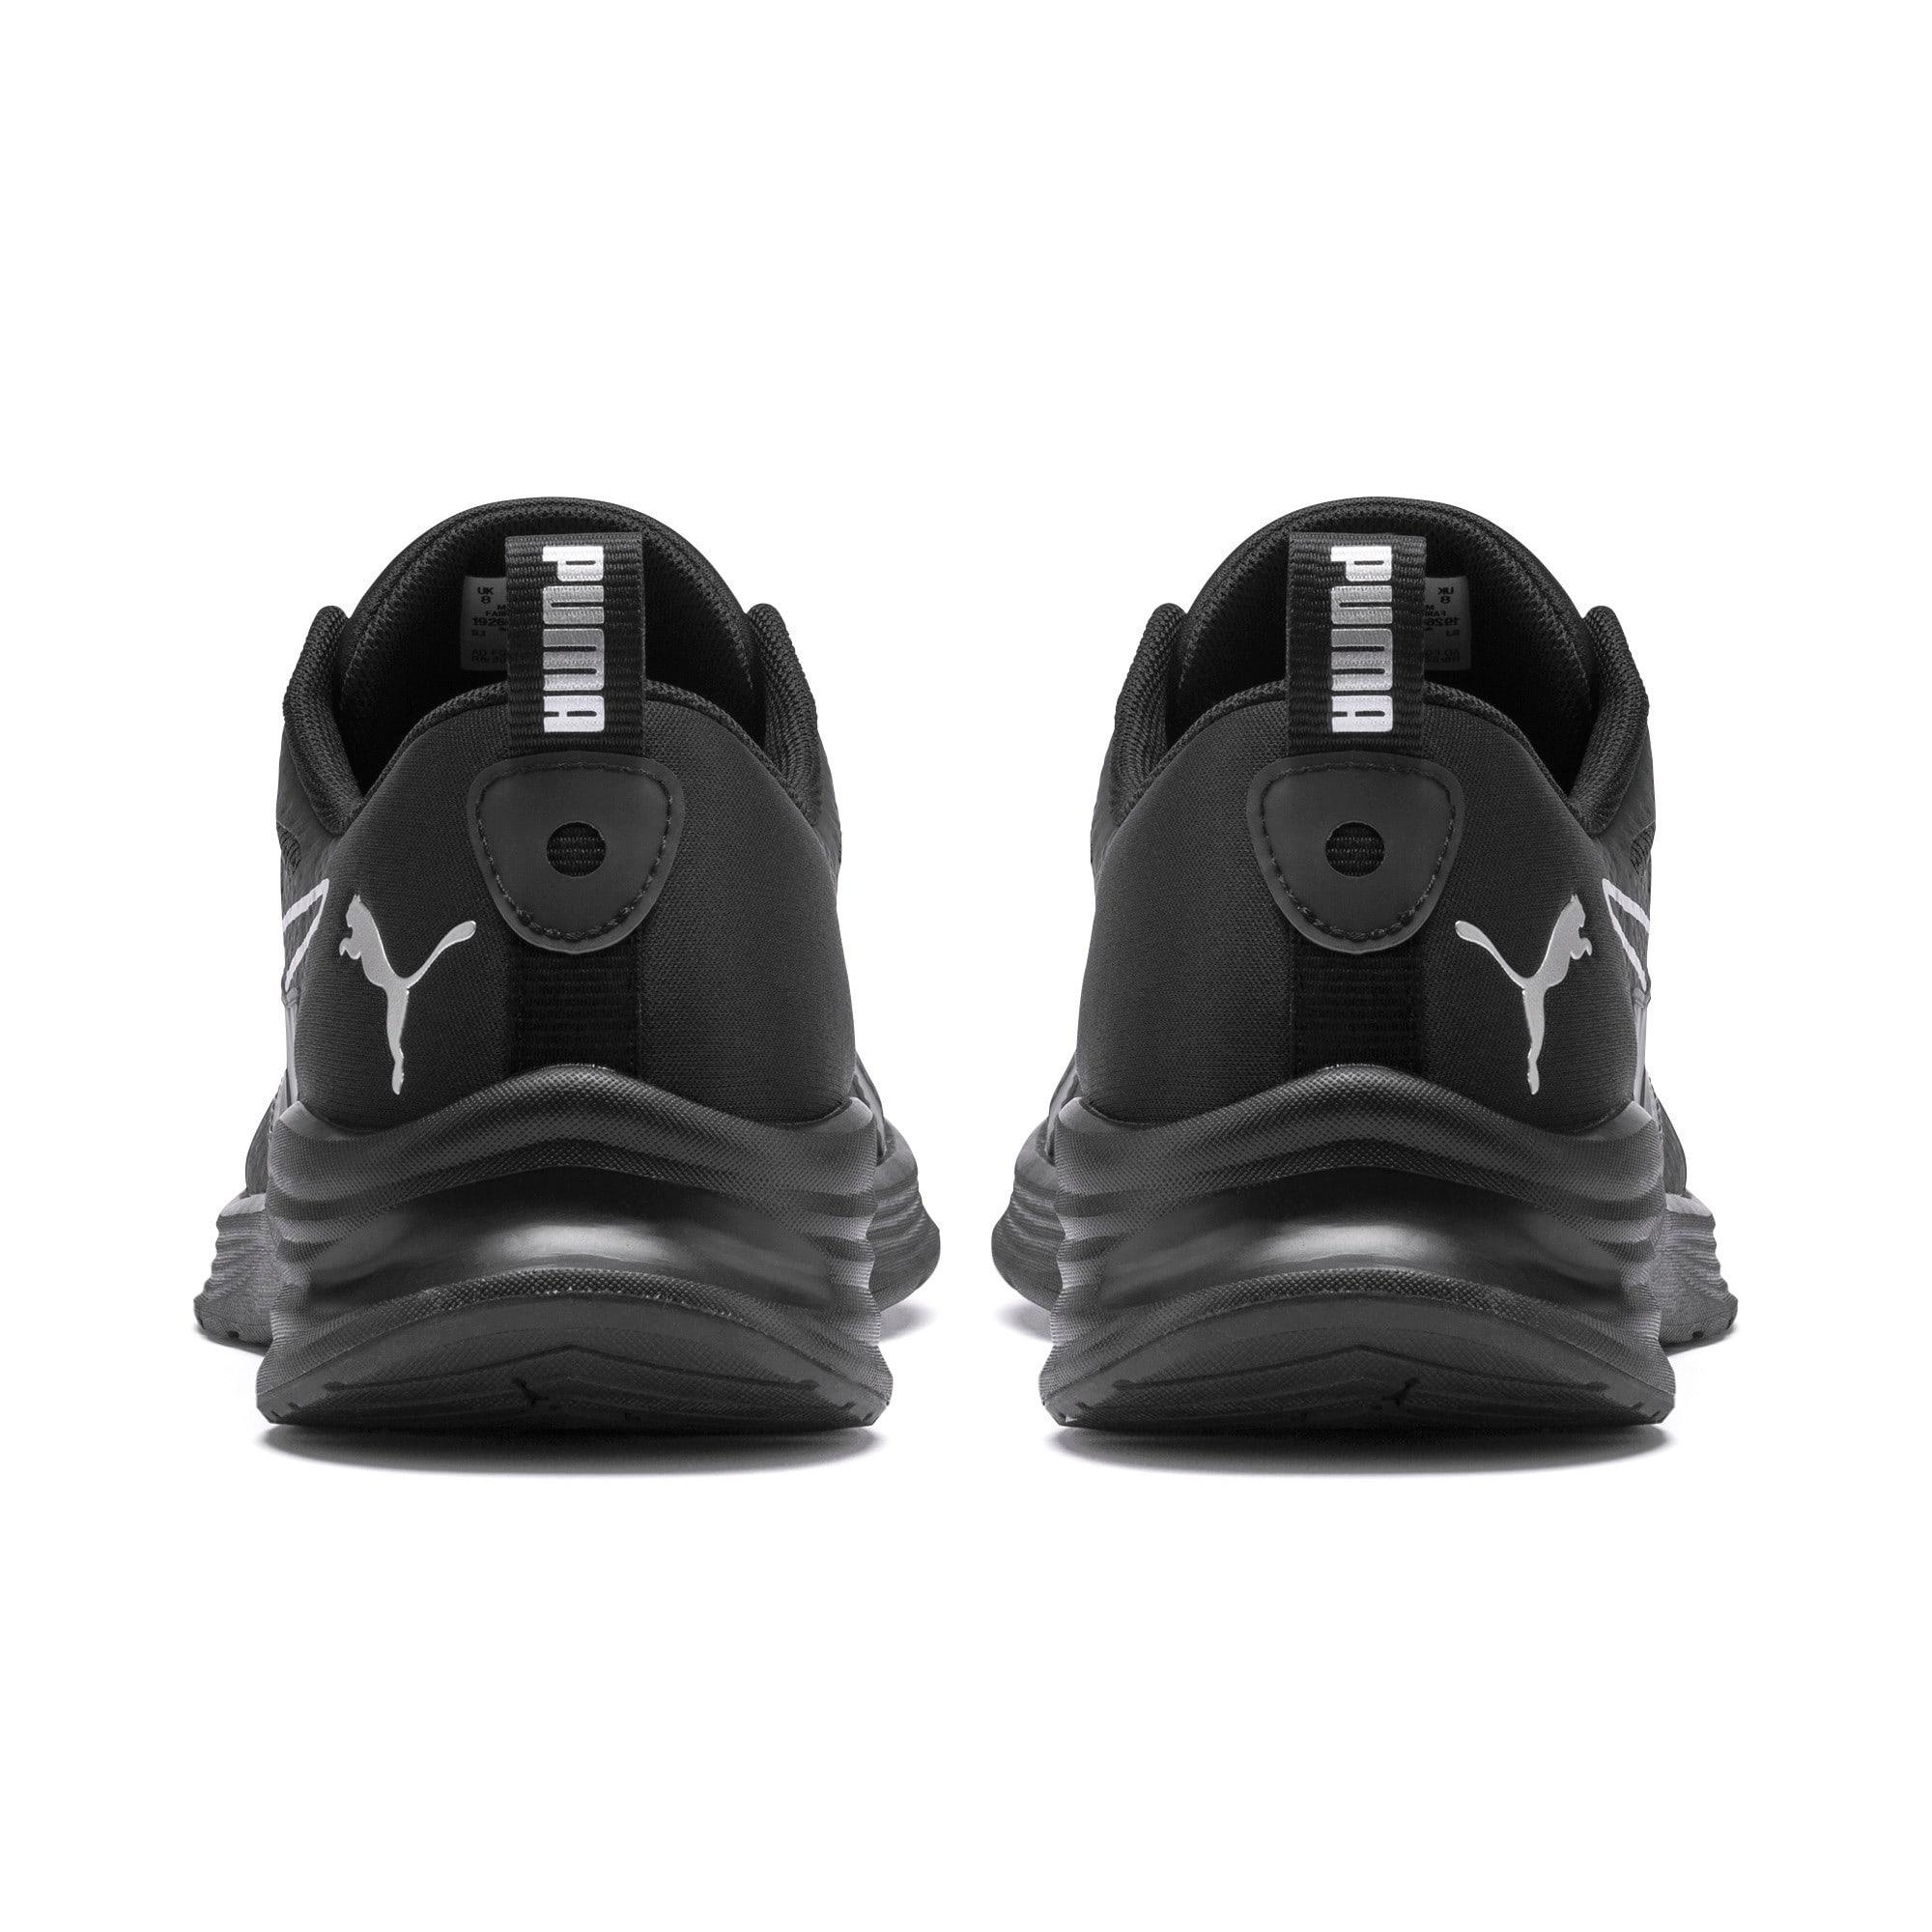 Thumbnail 4 of HYBRID Fuego Men's Running Shoes, Puma Black-Puma Black, medium